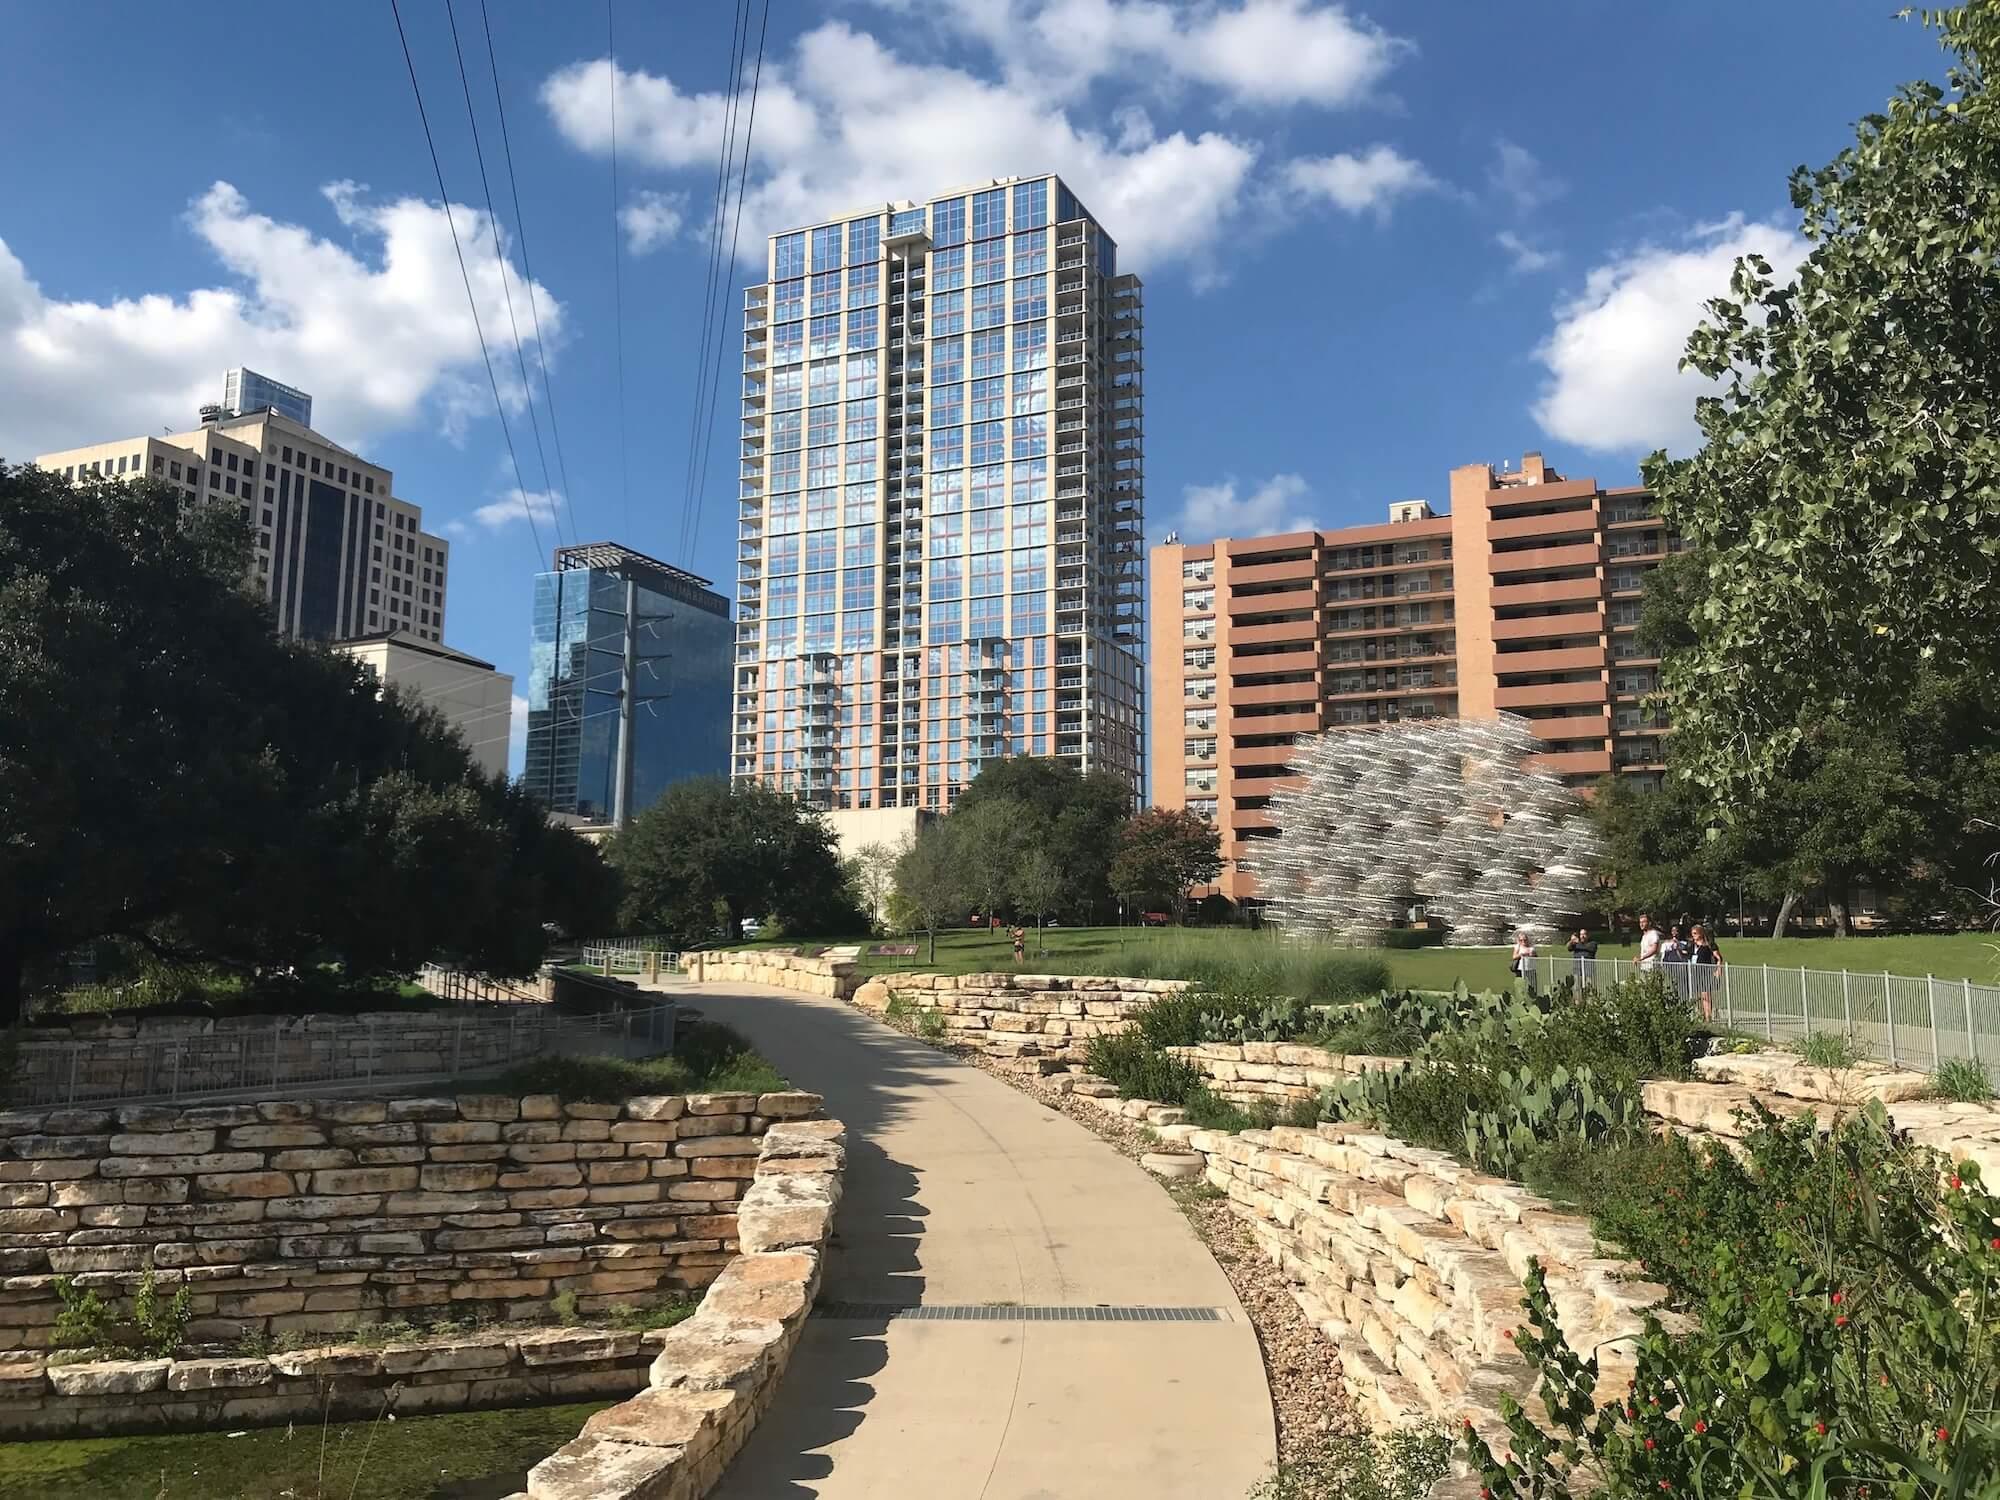 Perfect 3-Day Austin Itinerary